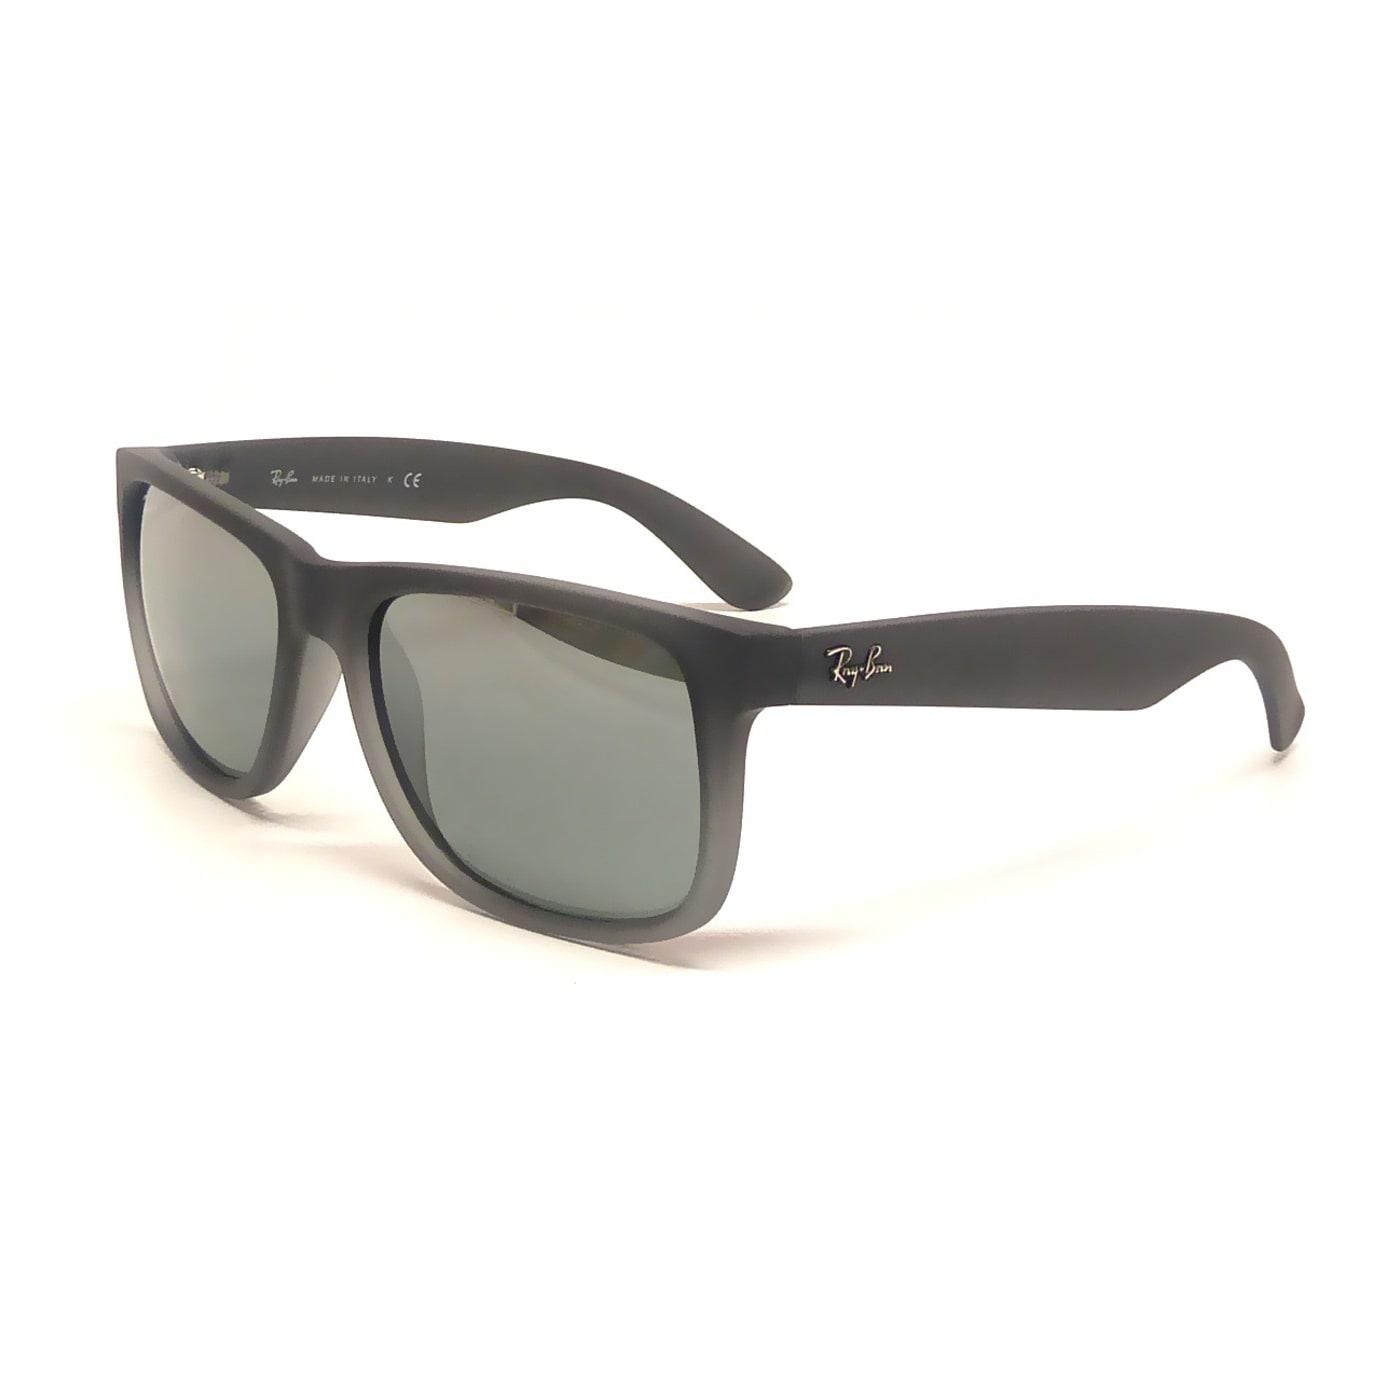 2e4a16a3f5 Ray-Ban Justin Wayfarer RB4165 Unisex Gray Frame Silver Gradient Lens  Sunglasses